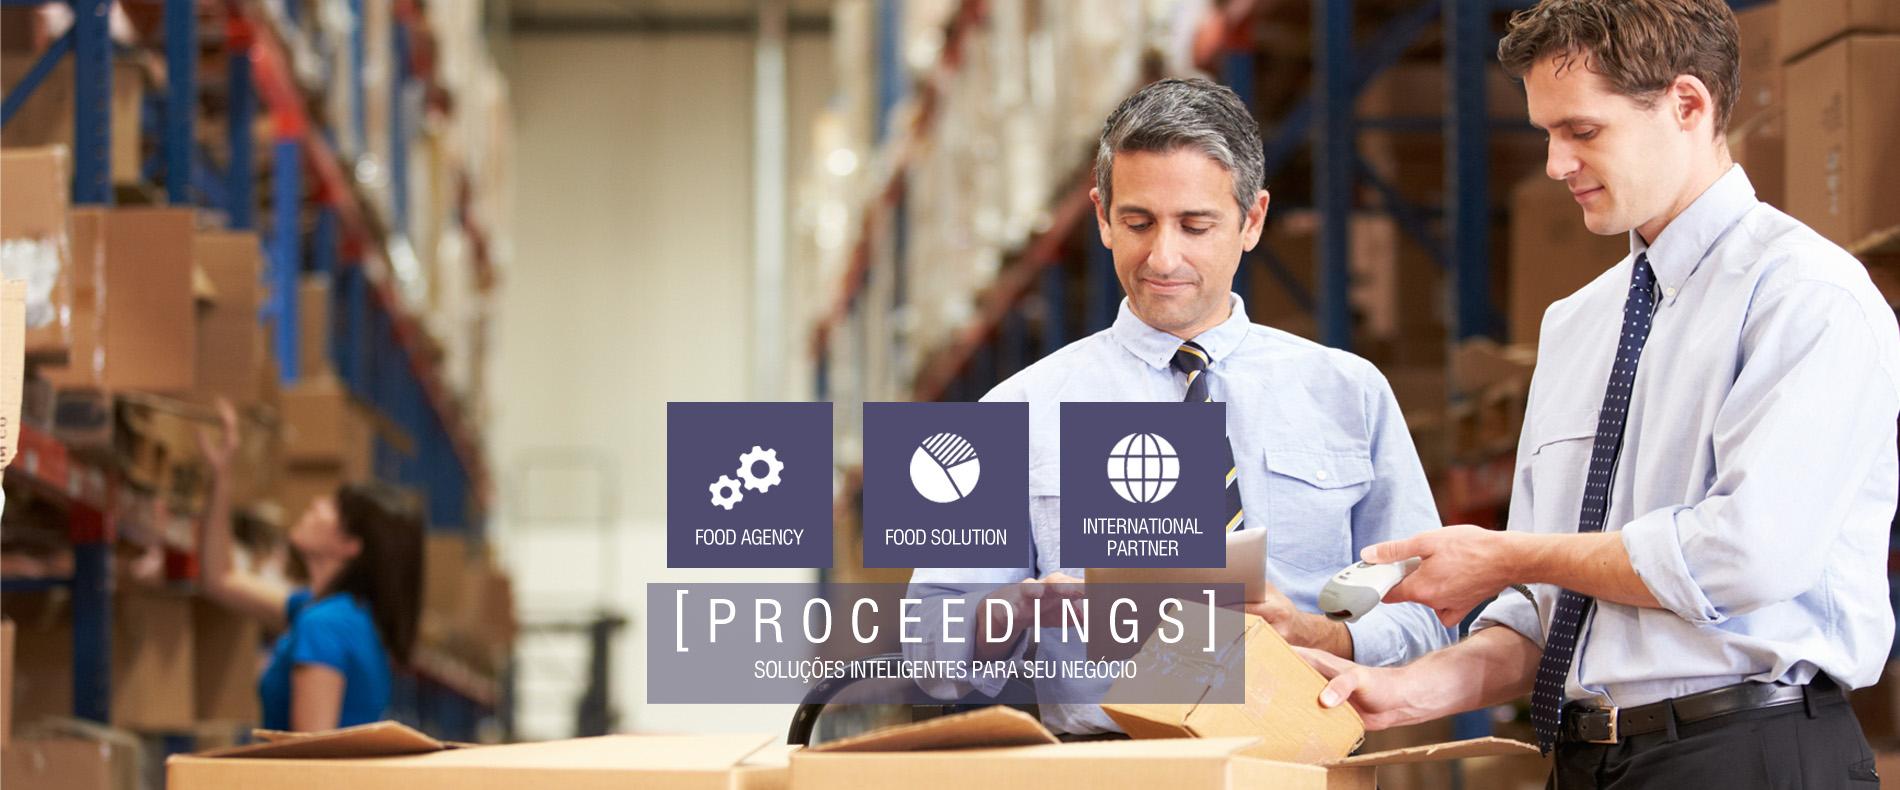 Proceedings International Food Business]